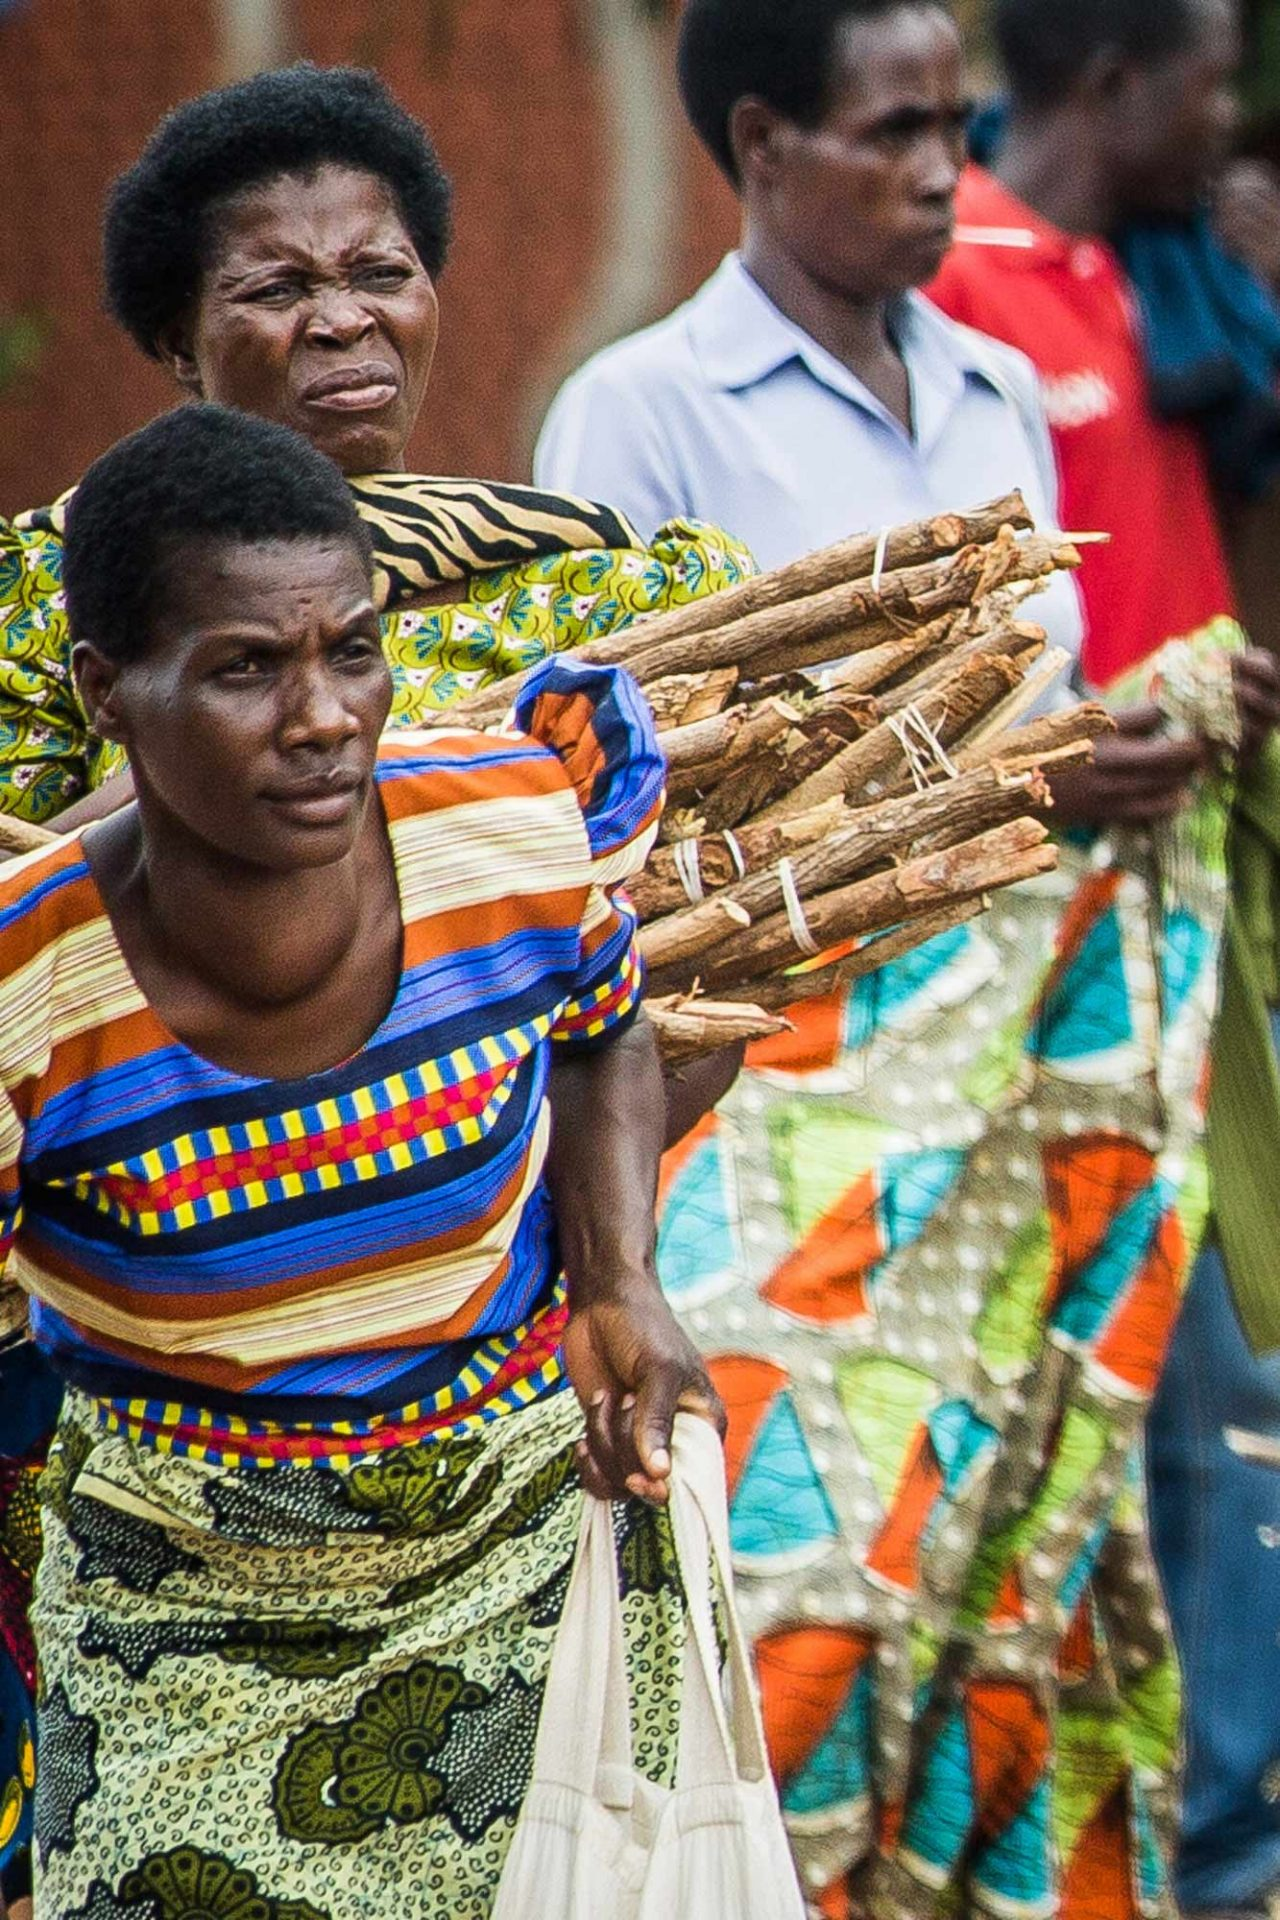 Michelle-Stock-Reportage-Fotografie-Malawi-Afrika_O8A0302